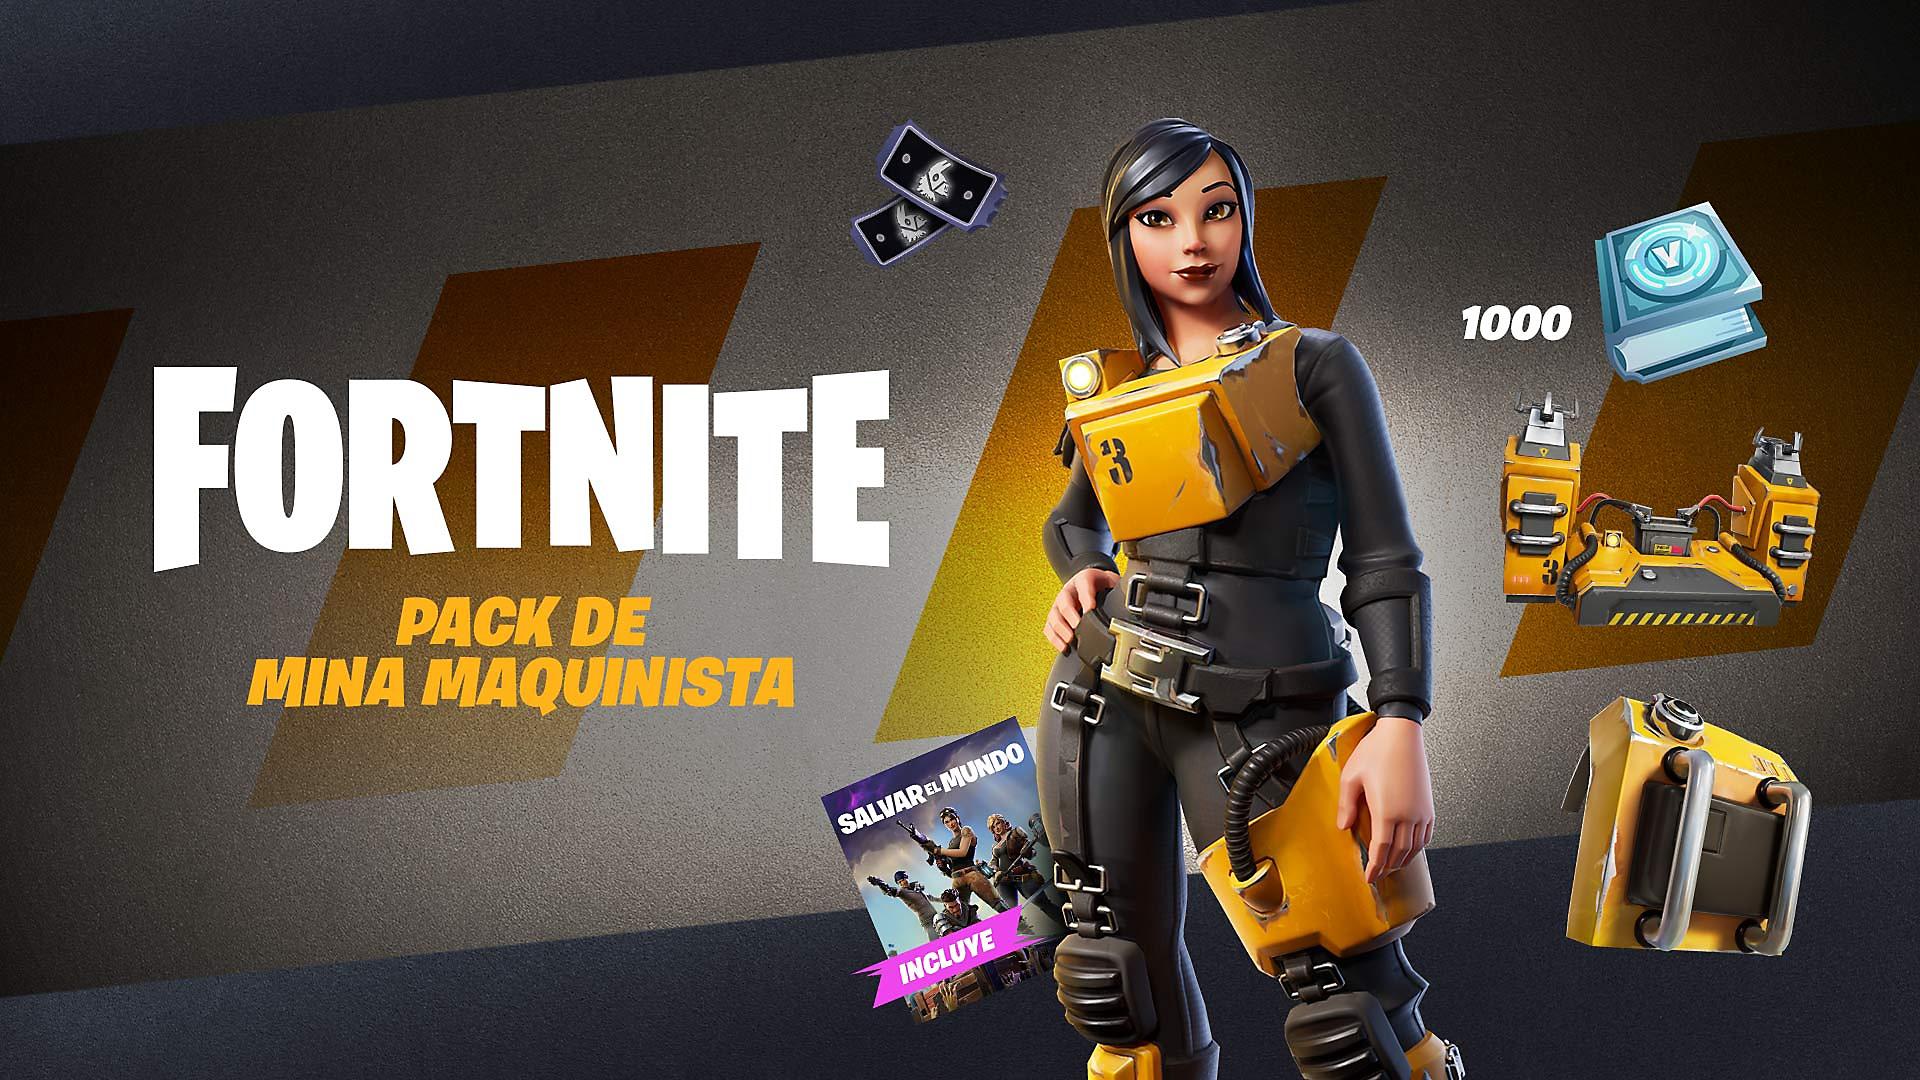 Fortnite - Pack de Fuerza motriz - Arte de la tienda